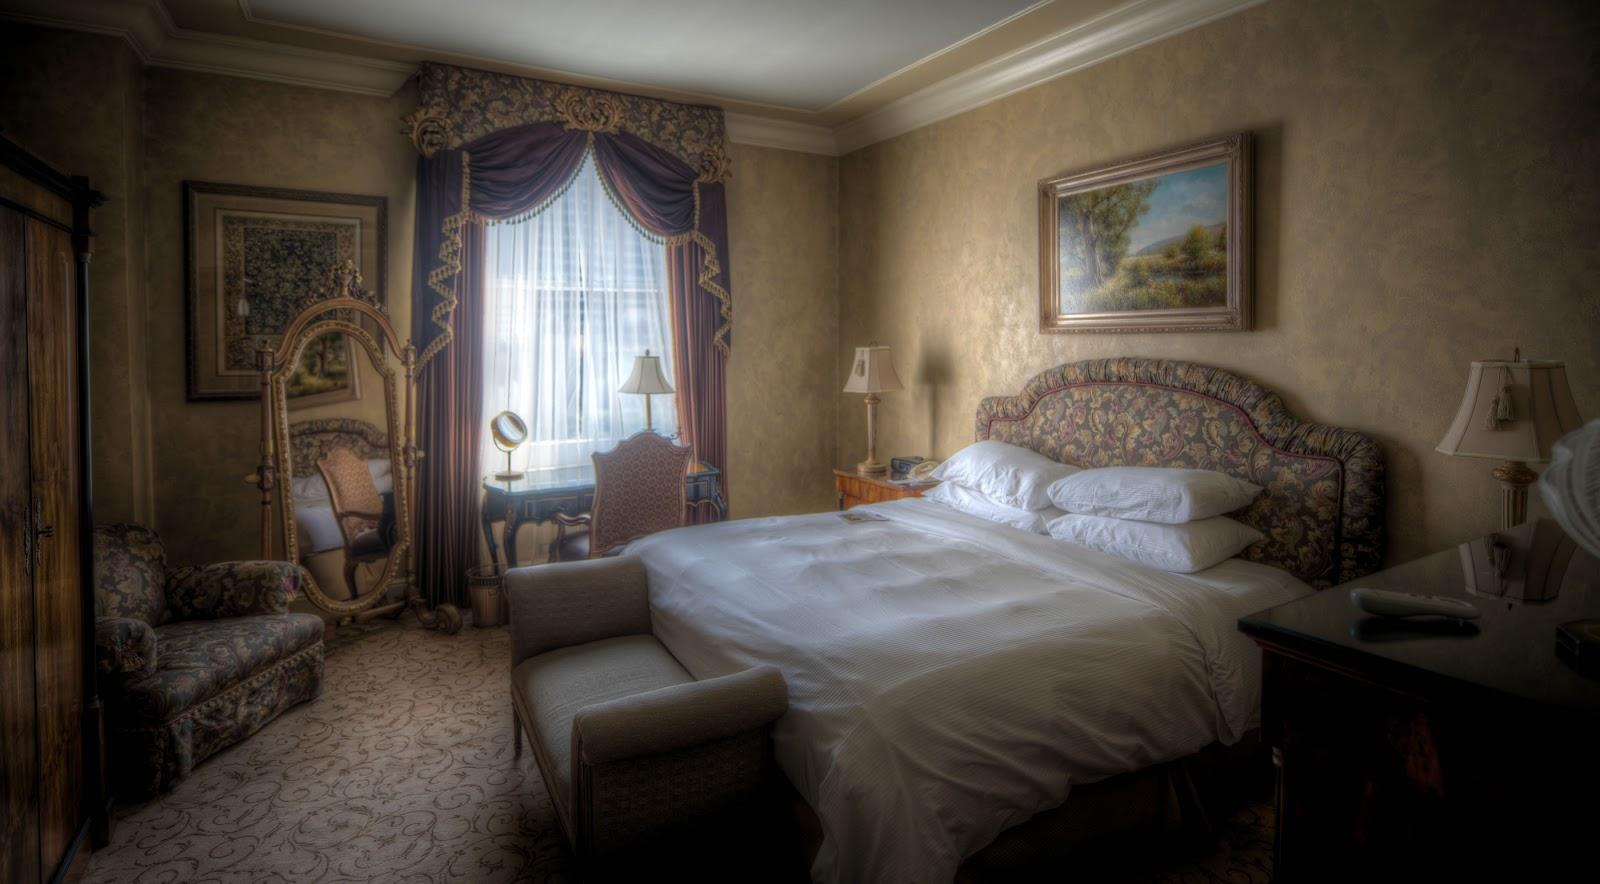 Hotel Mewah (Luxury Hotel)